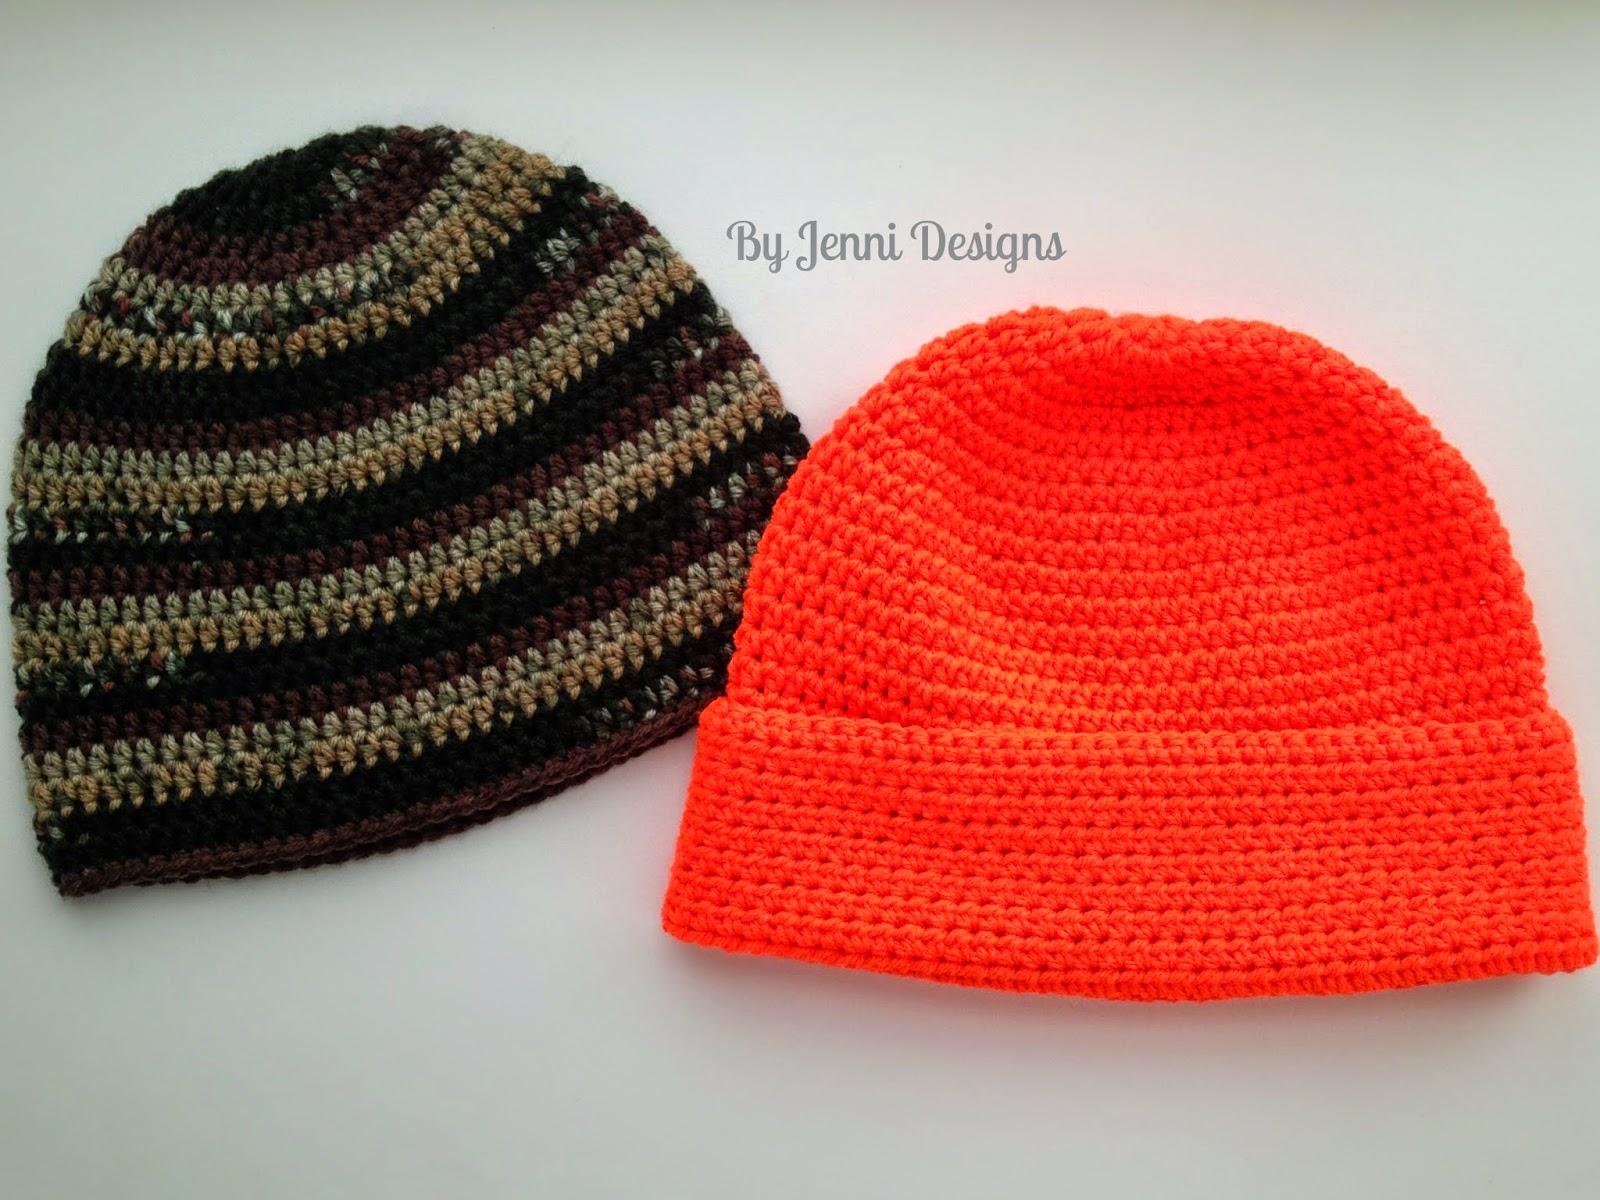 Free Crochet Pattern Hdc Beanie : By Jenni Designs: Free Crochet Pattern: Mens Basic Beanie ...